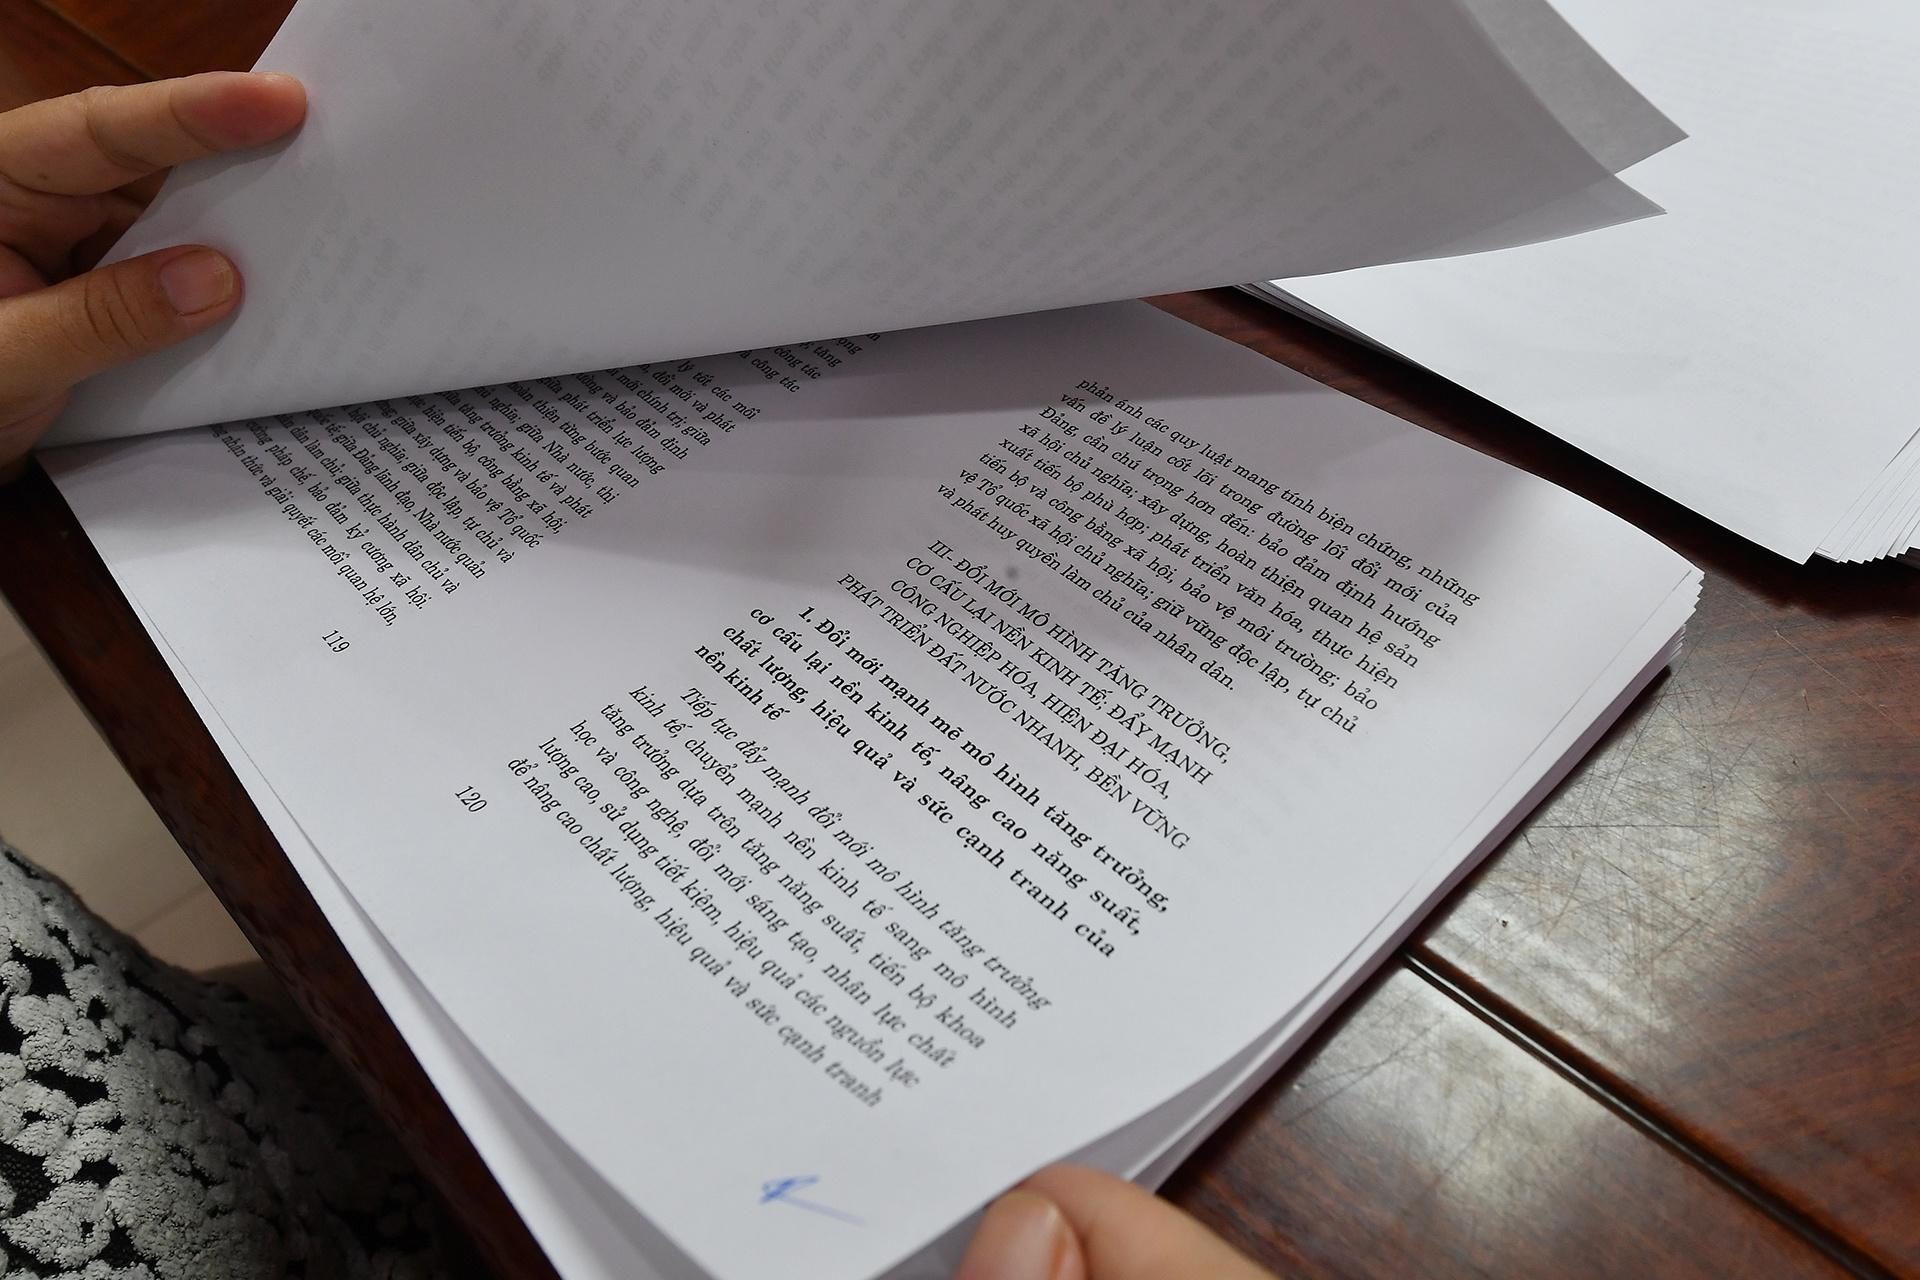 phat hanh Van kien Dai hoi Dang XIII anh 9